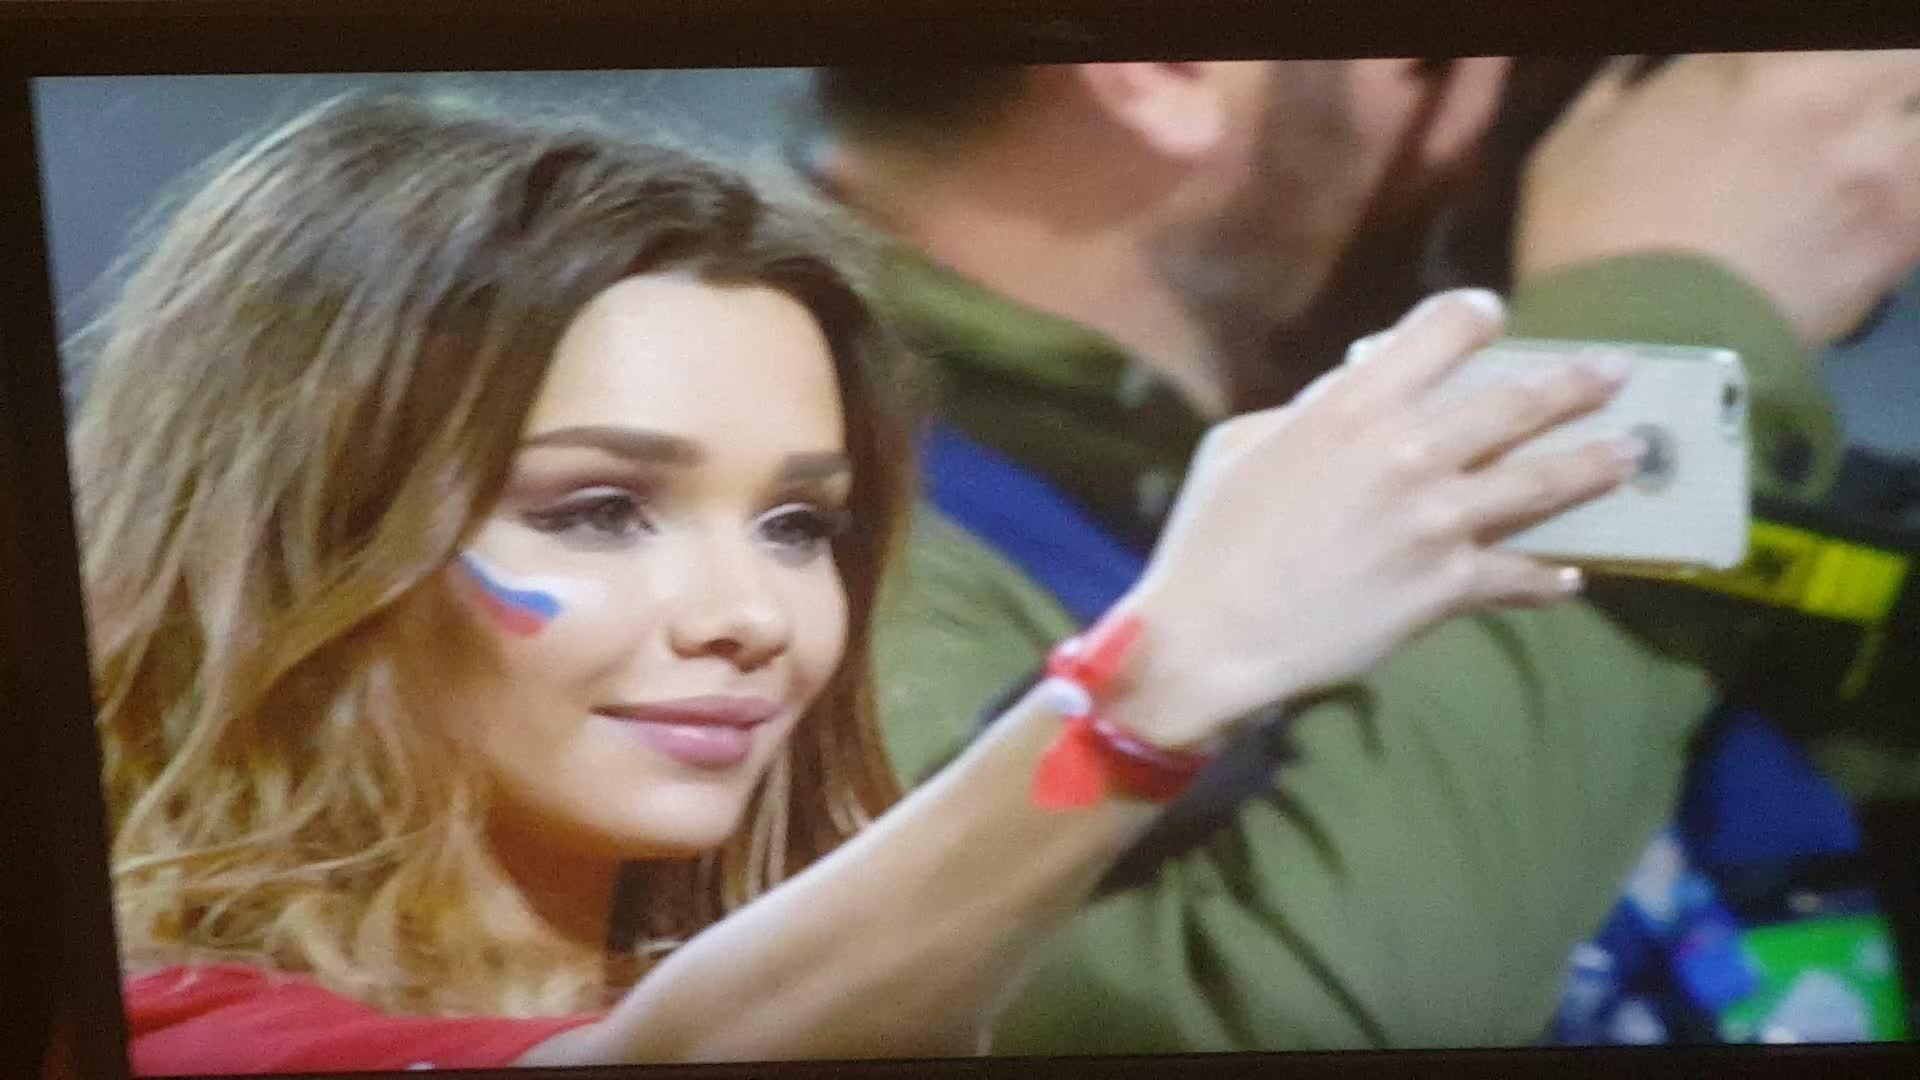 ImagesOfRussia, cutegirlgifs, imagesofrussia, Russian soccer fan GIFs